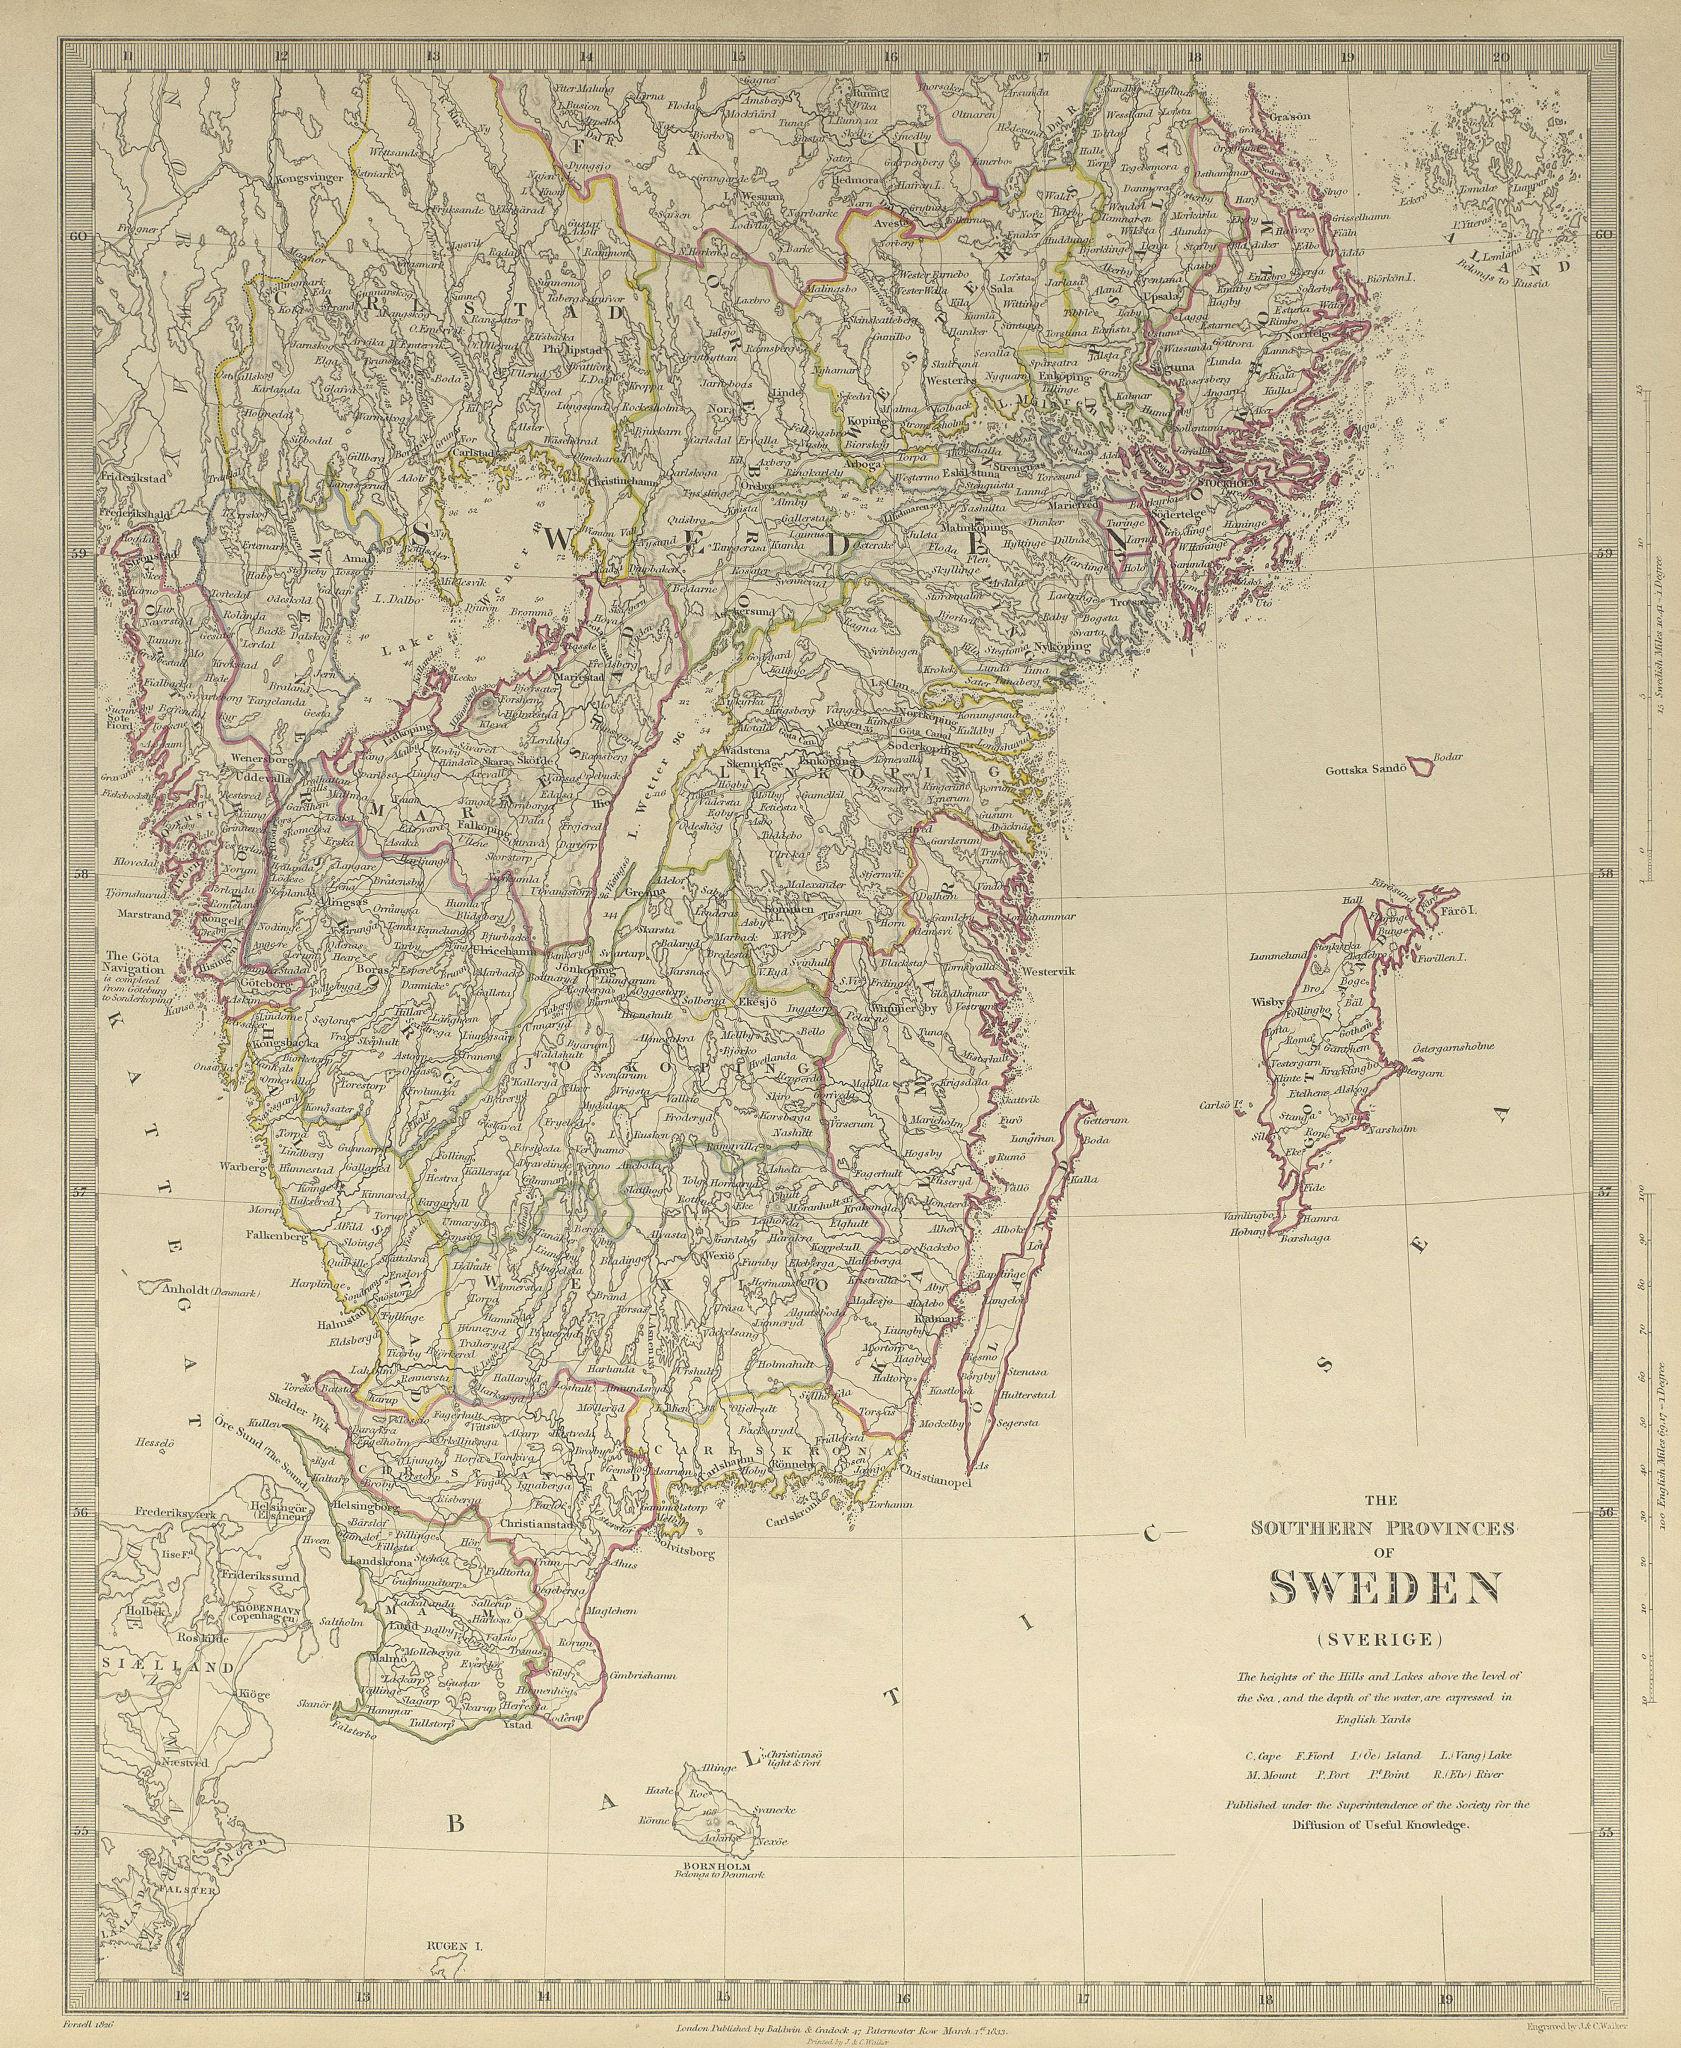 Associate Product SWEDEN. the Southern Provinces of Sweden (Sverige) . SDUK 1844 old antique map